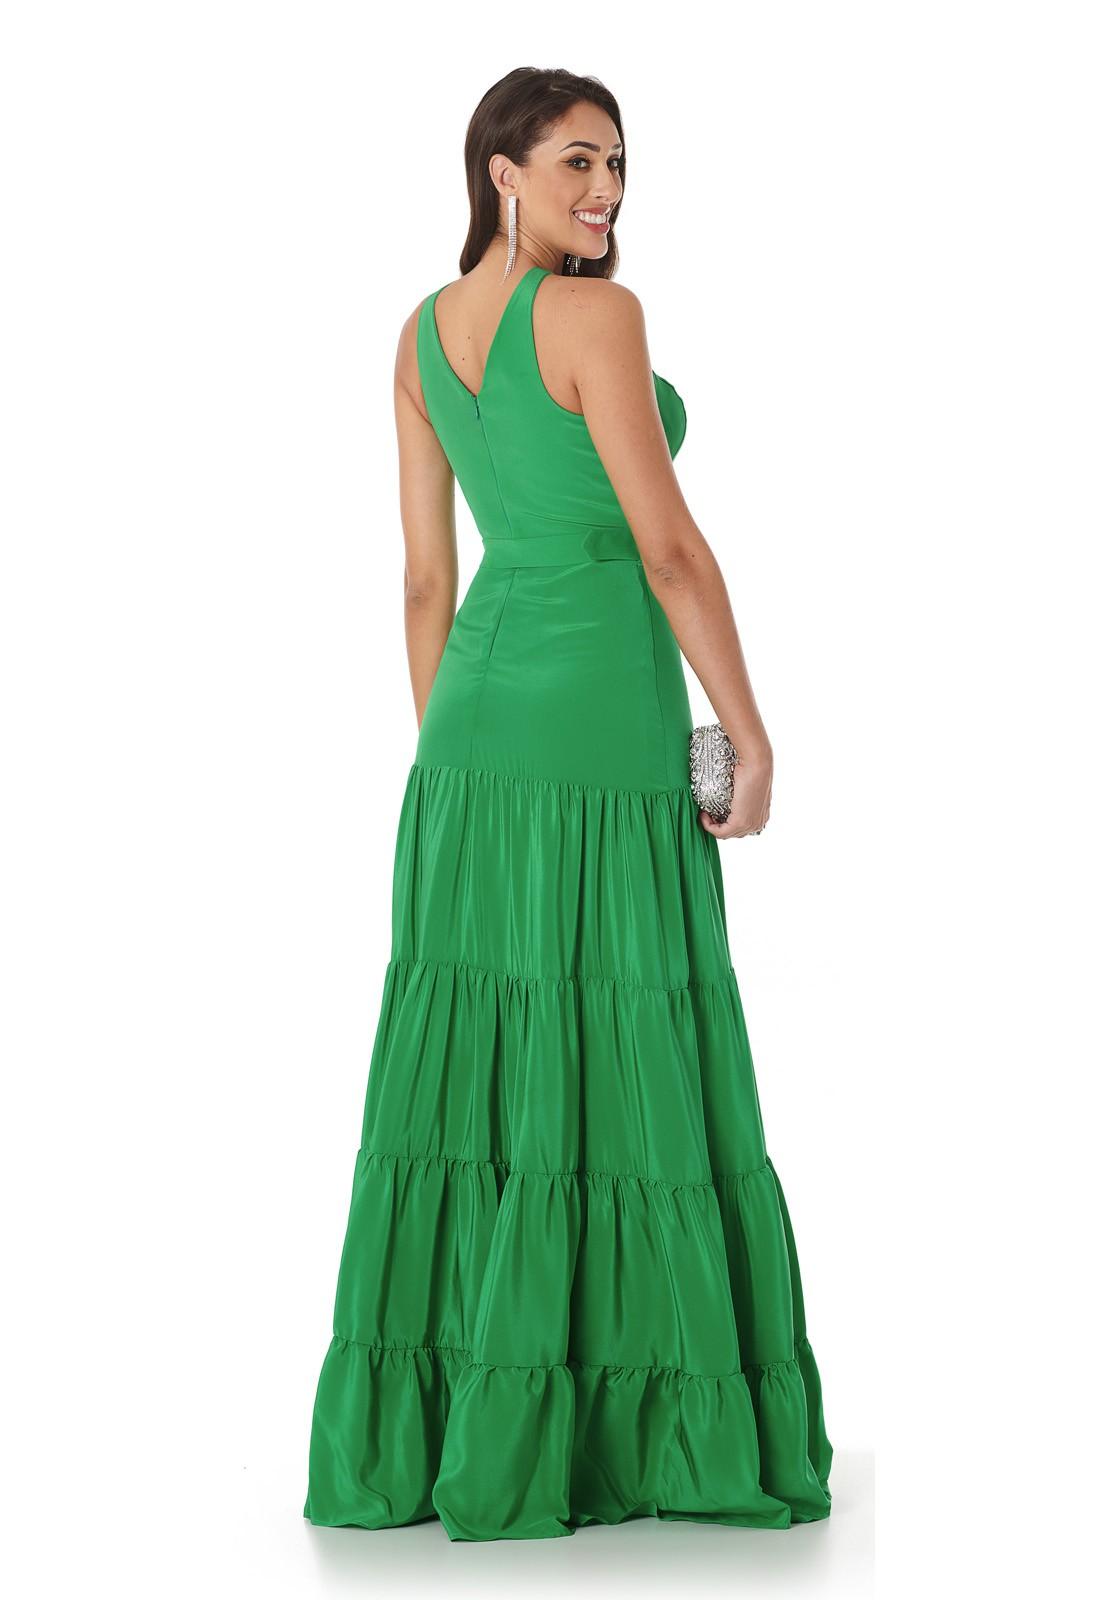 Vestido Longo Camadas Verde Emerald Lala Dubi